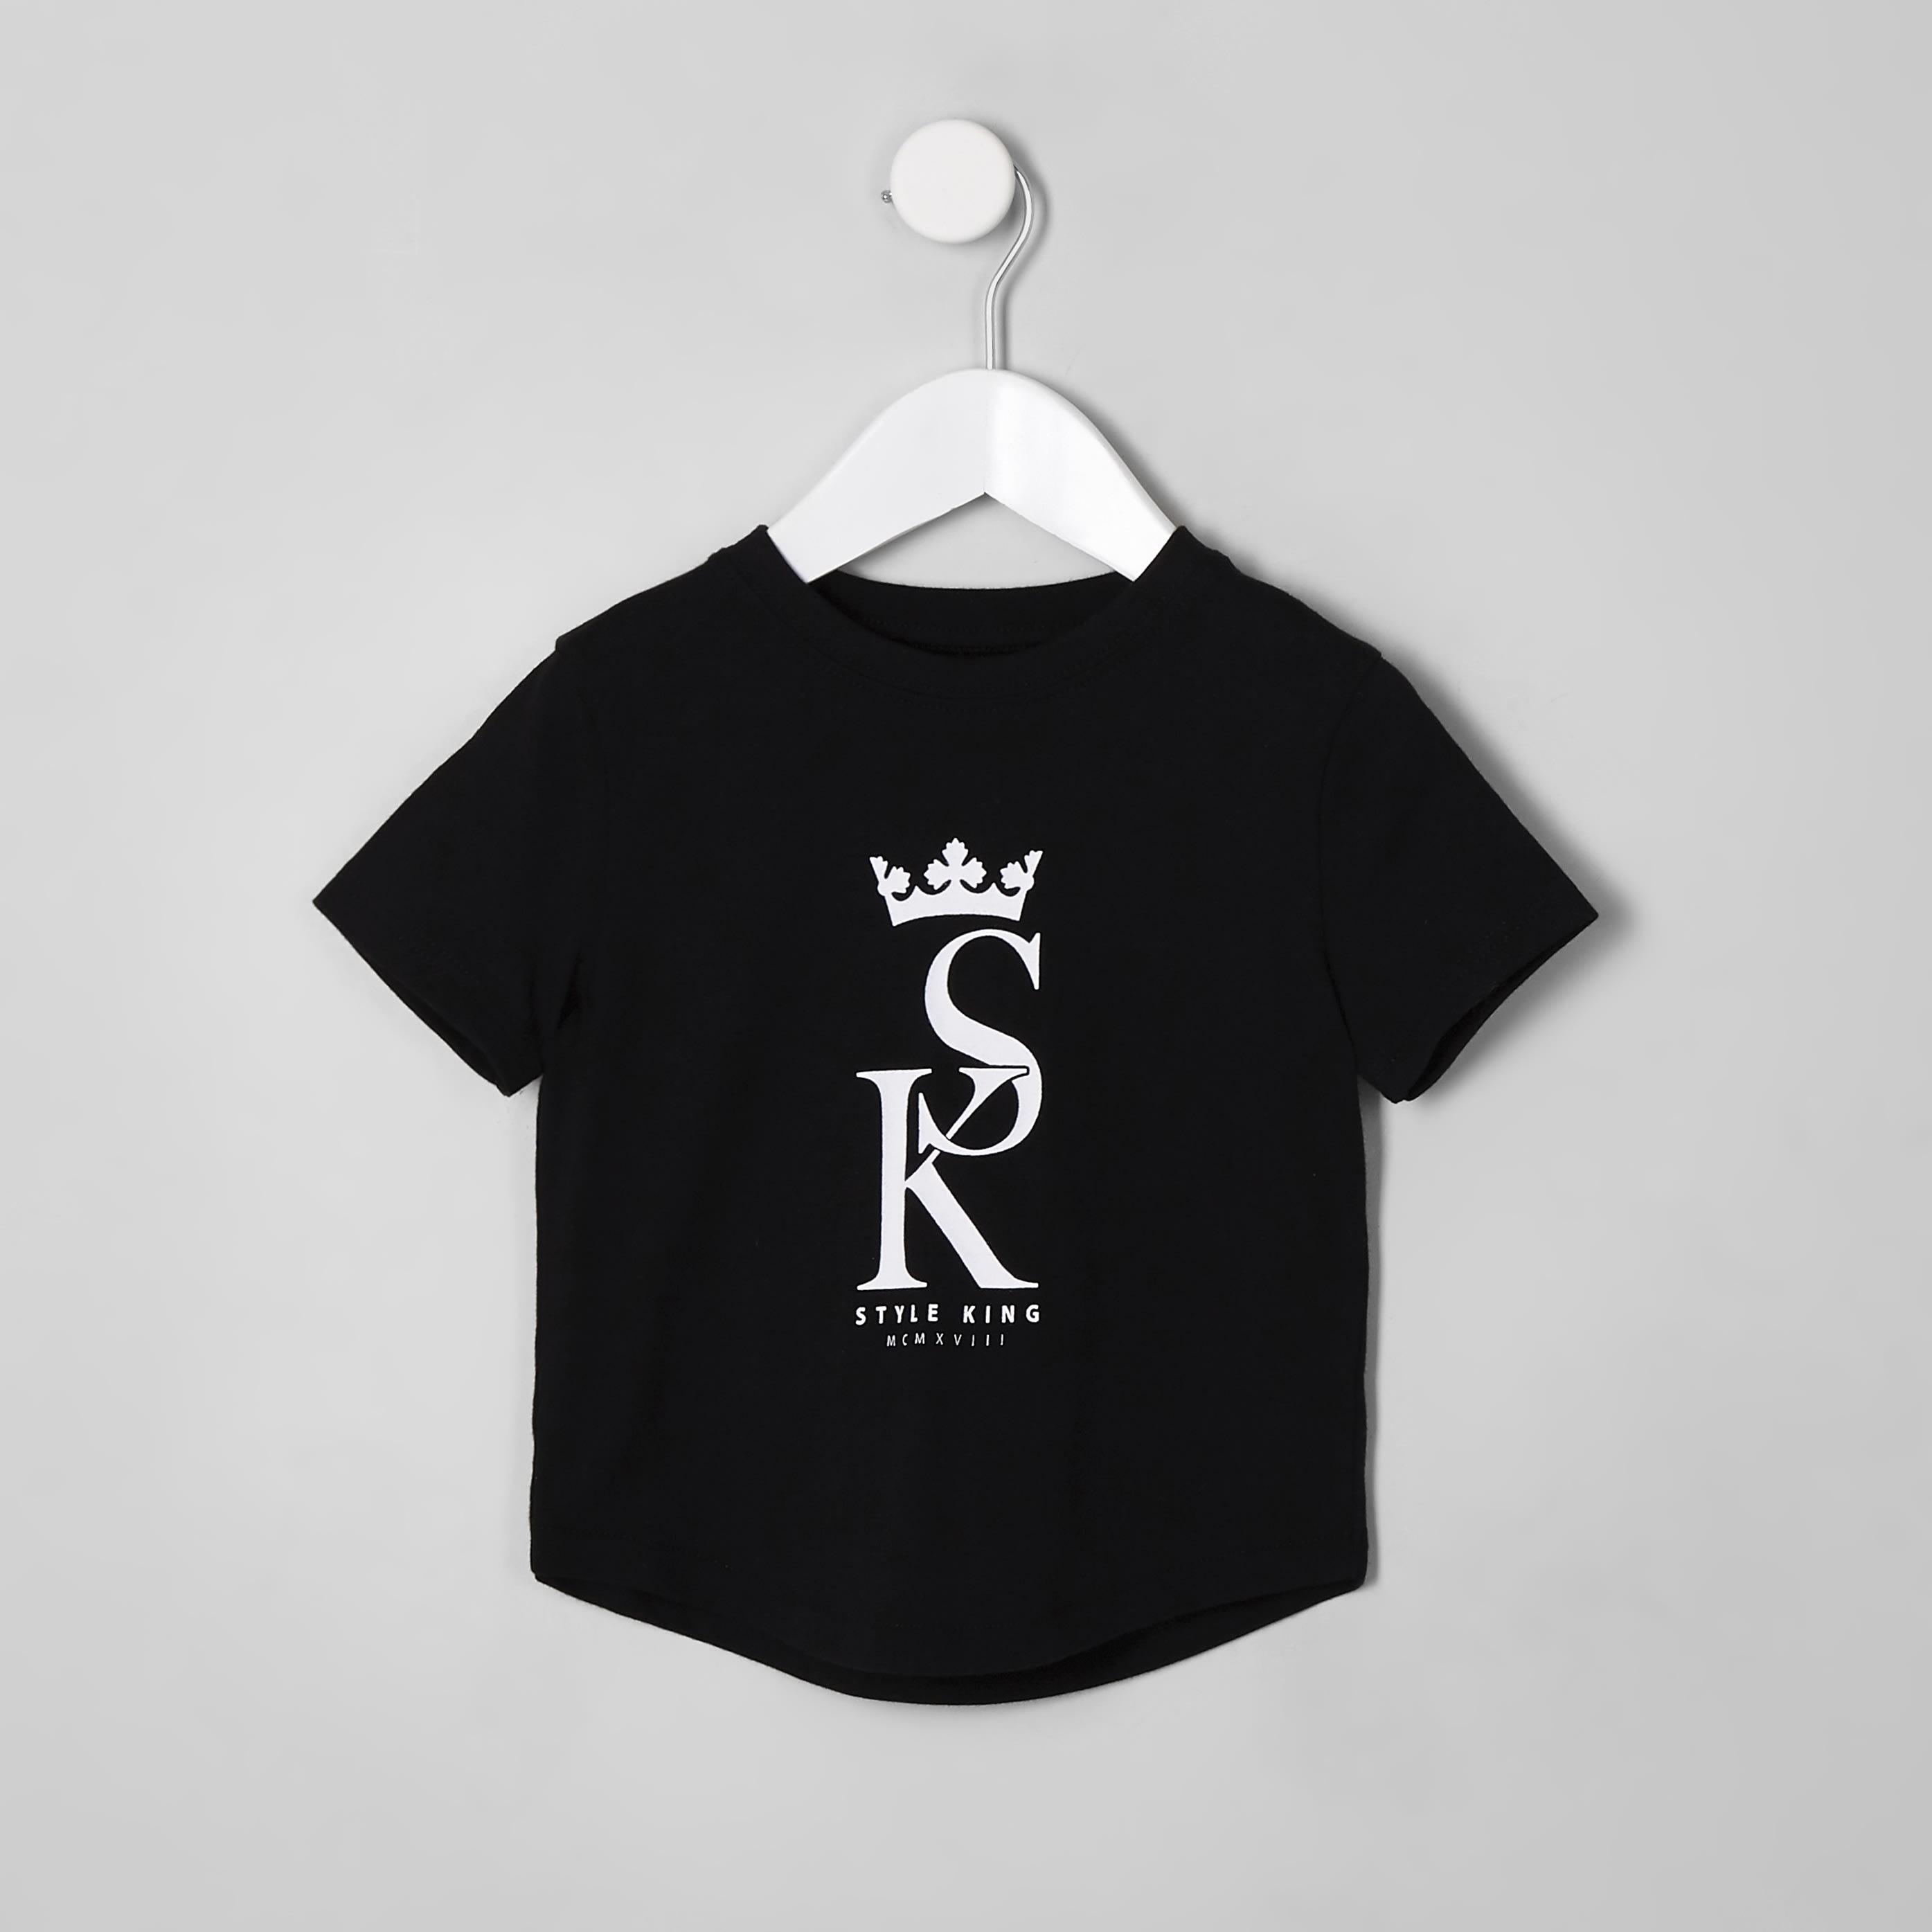 River Island Mens Baby Boys Black 'style king' T-shirt (12-18 Mths)